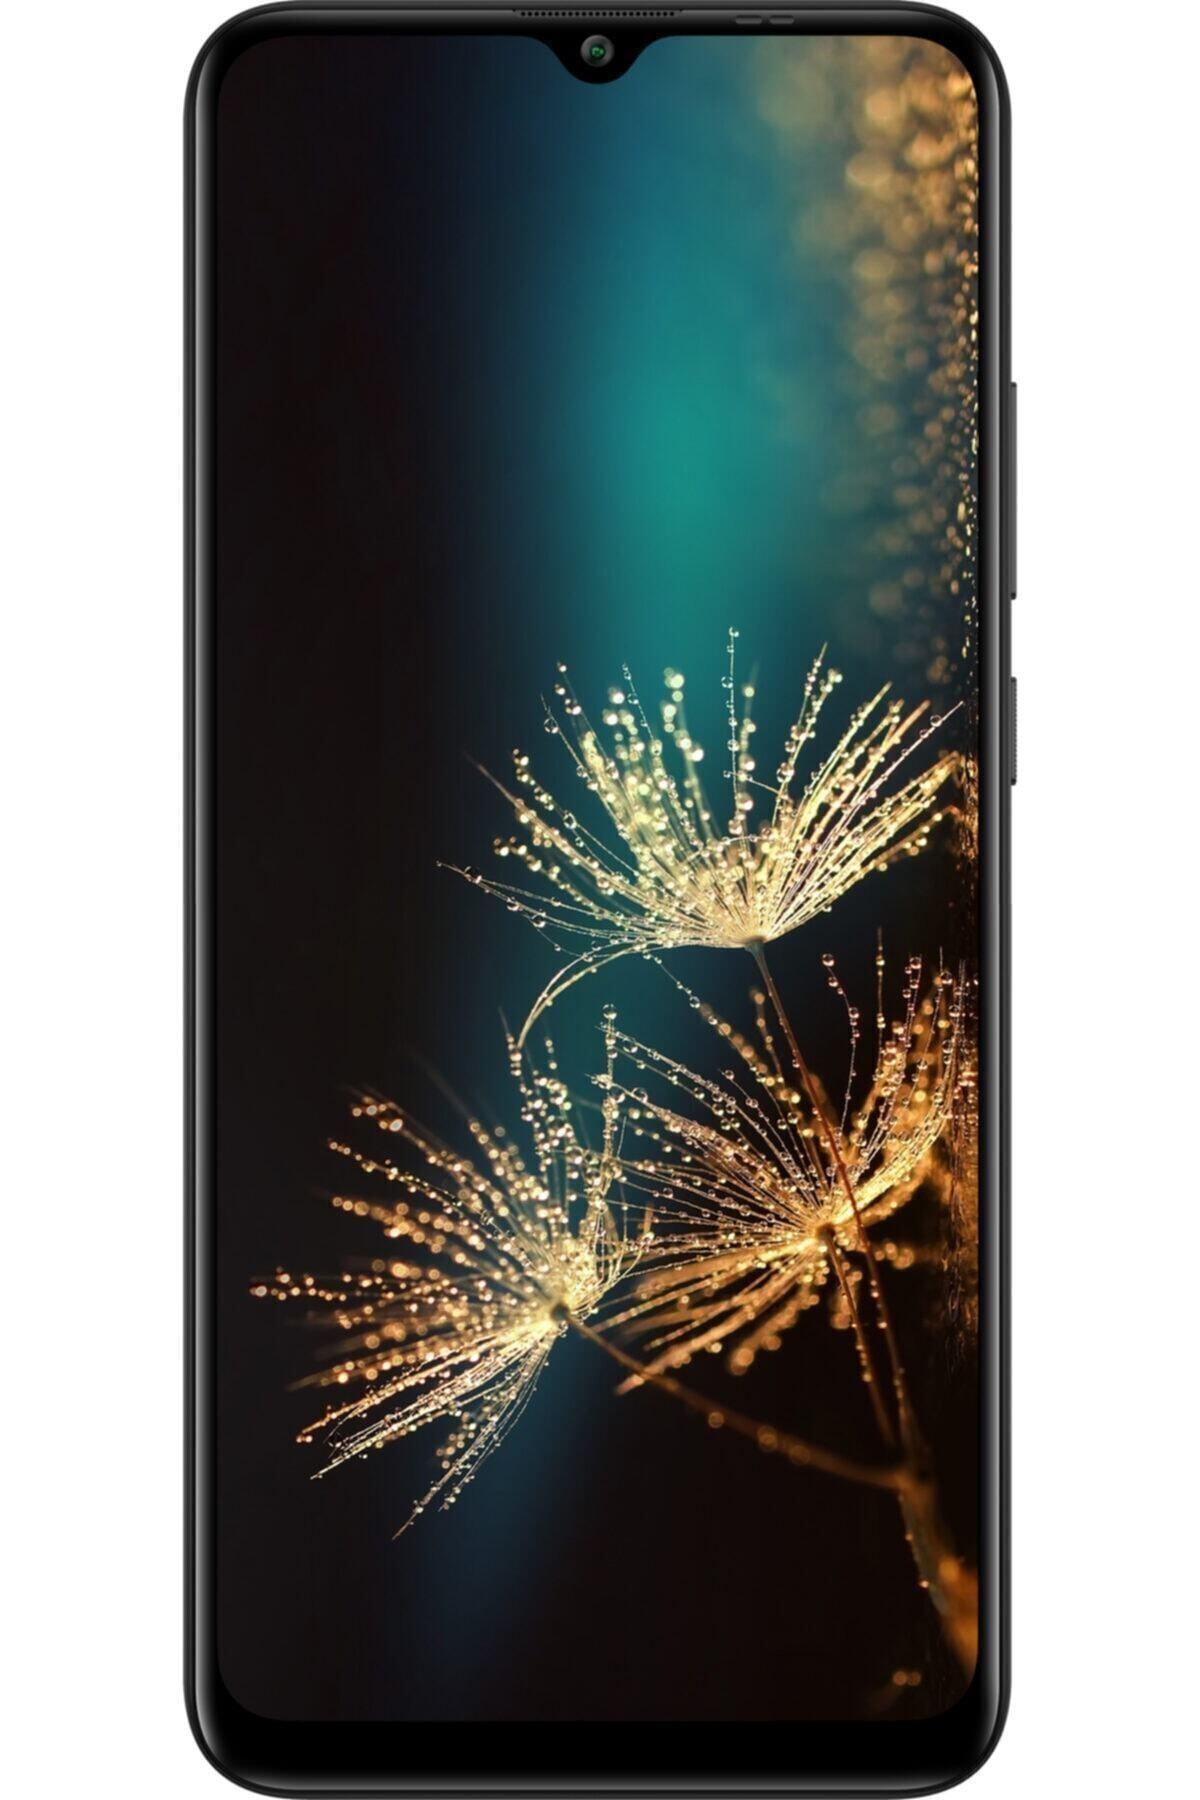 GM 21 Plus 64GB Siyah Cep Telefonu (General Mobile Türkiye Garantili)